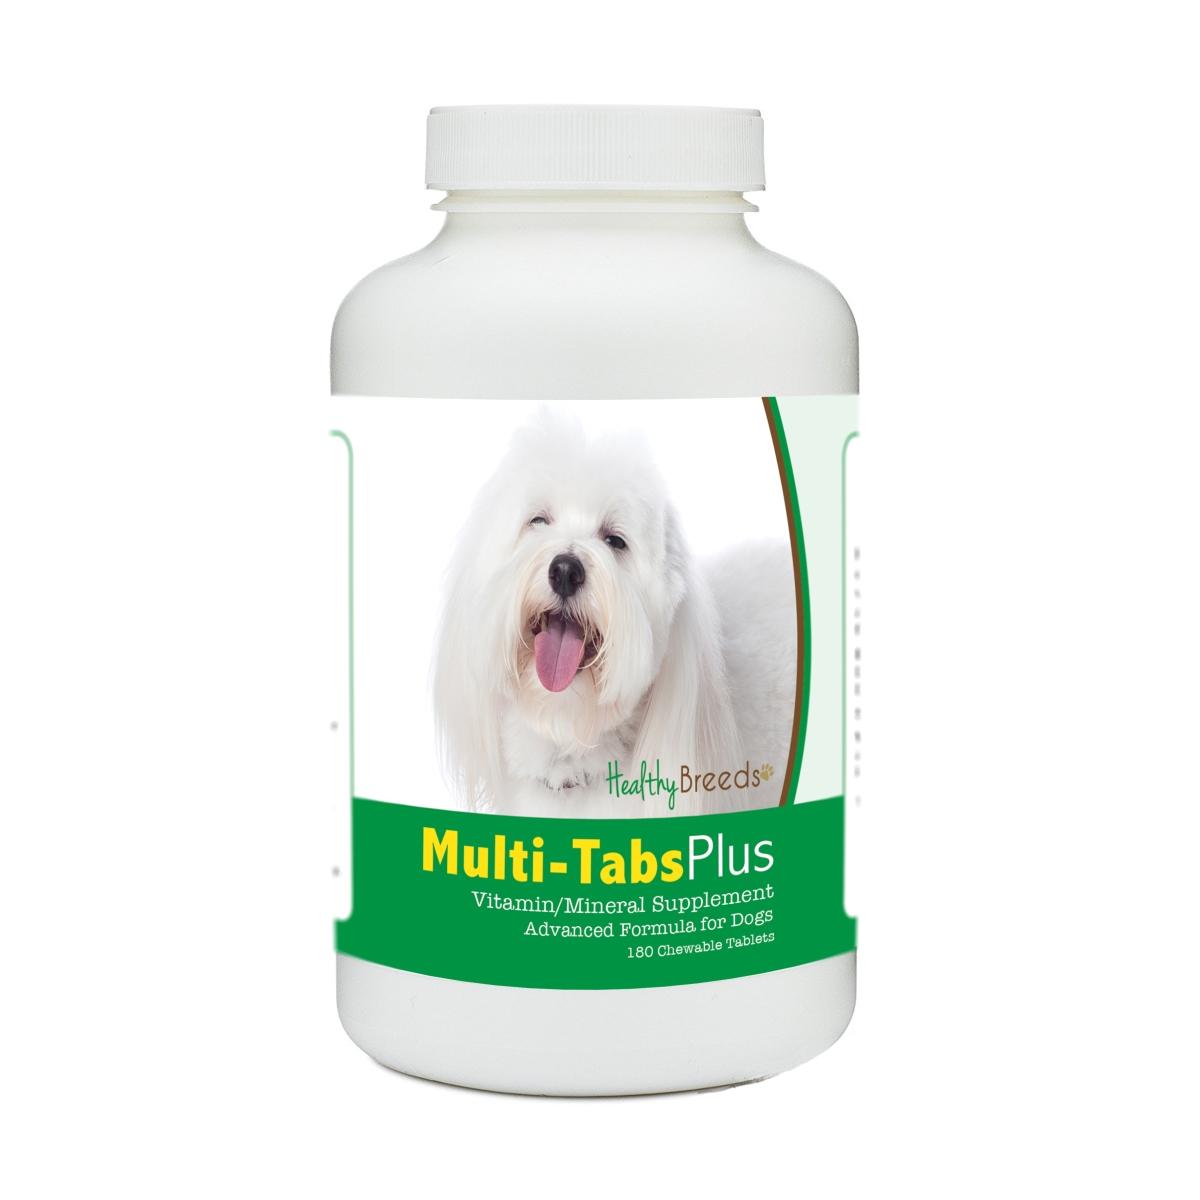 Healthy Breeds 840235176695 Coton de Tulear Multi-Tabs Plus Chewable Tablets - 180 Count